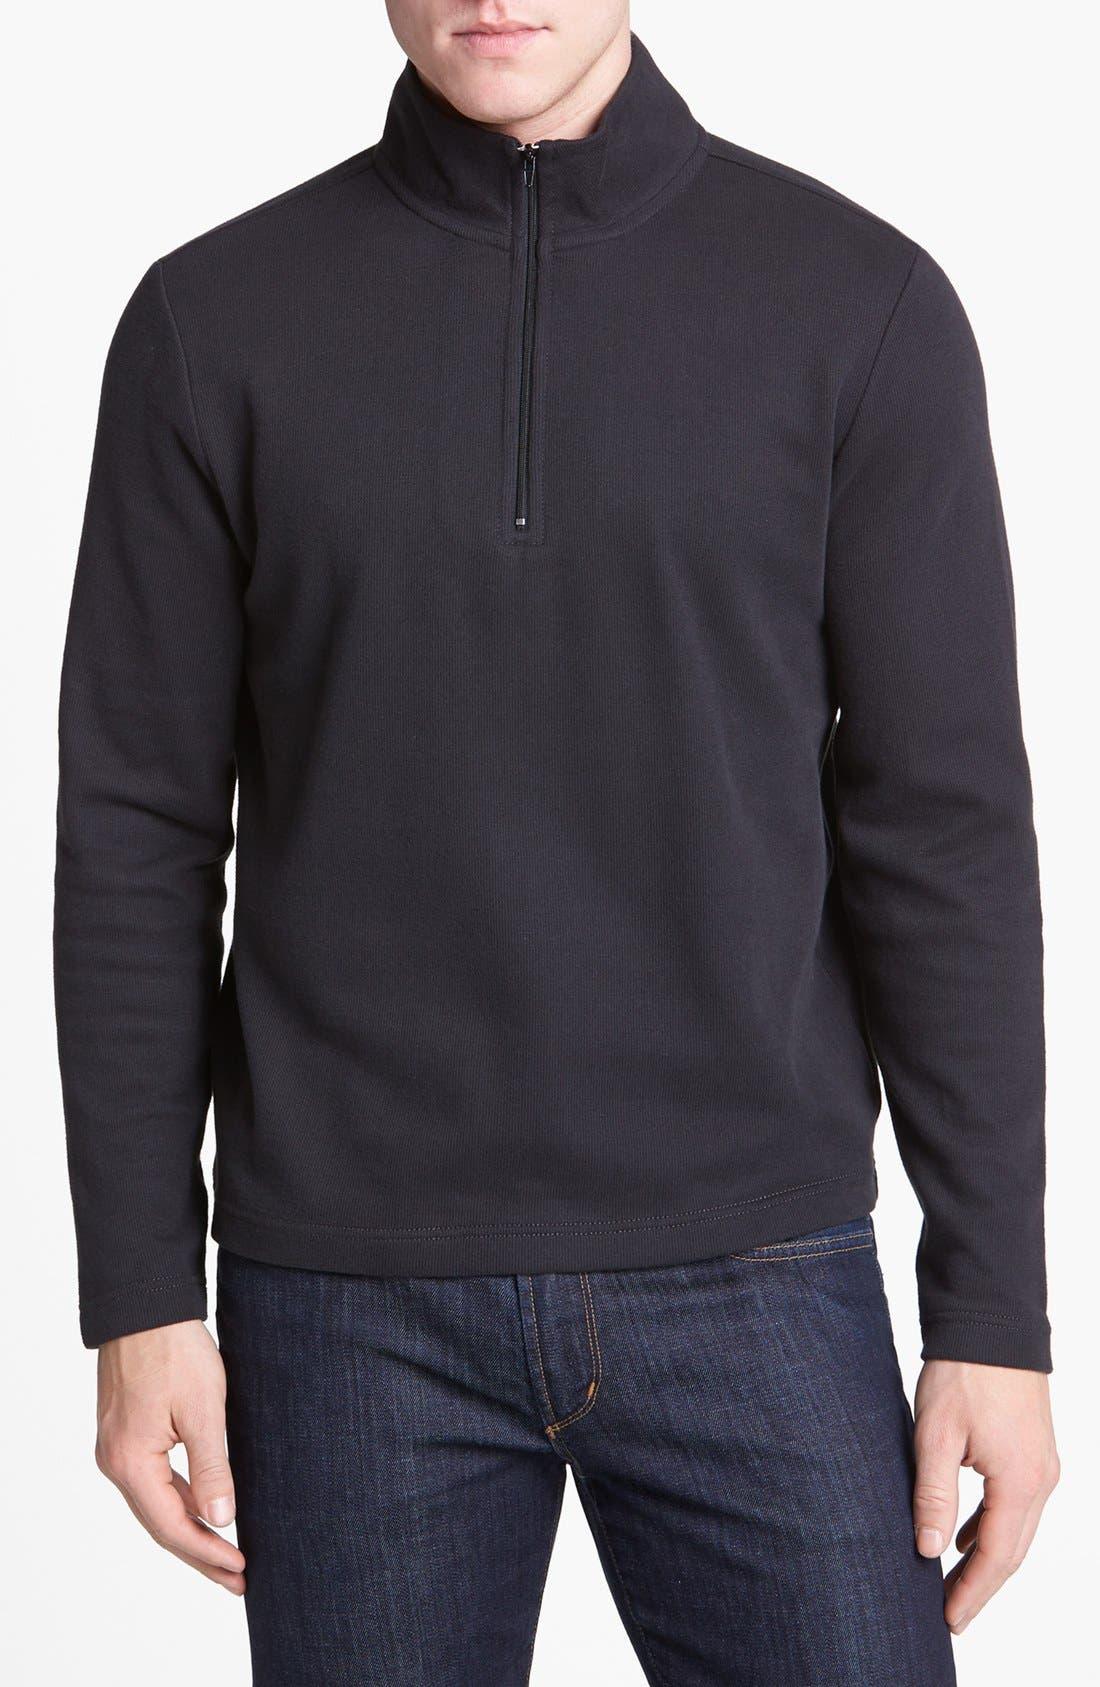 Alternate Image 1 Selected - Robert Barakett 'Niles' Half Zip Sweatshirt